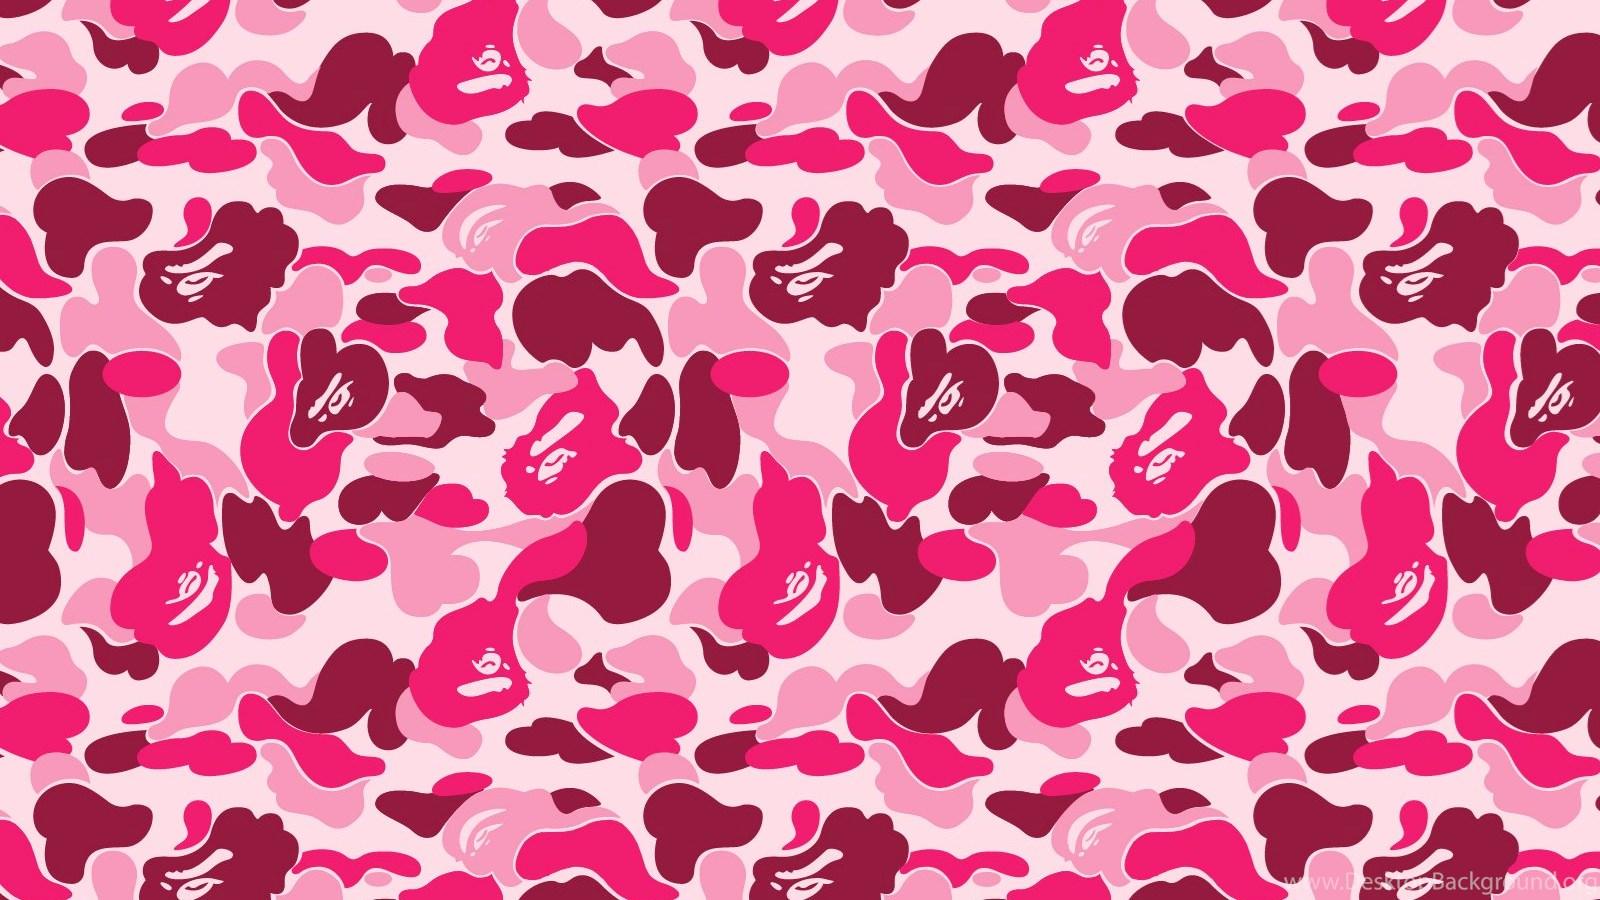 Hd Supreme Wallpaper Iphone X 1000 Images About Bape Camo Wallpaper Desktop Pink Jpg